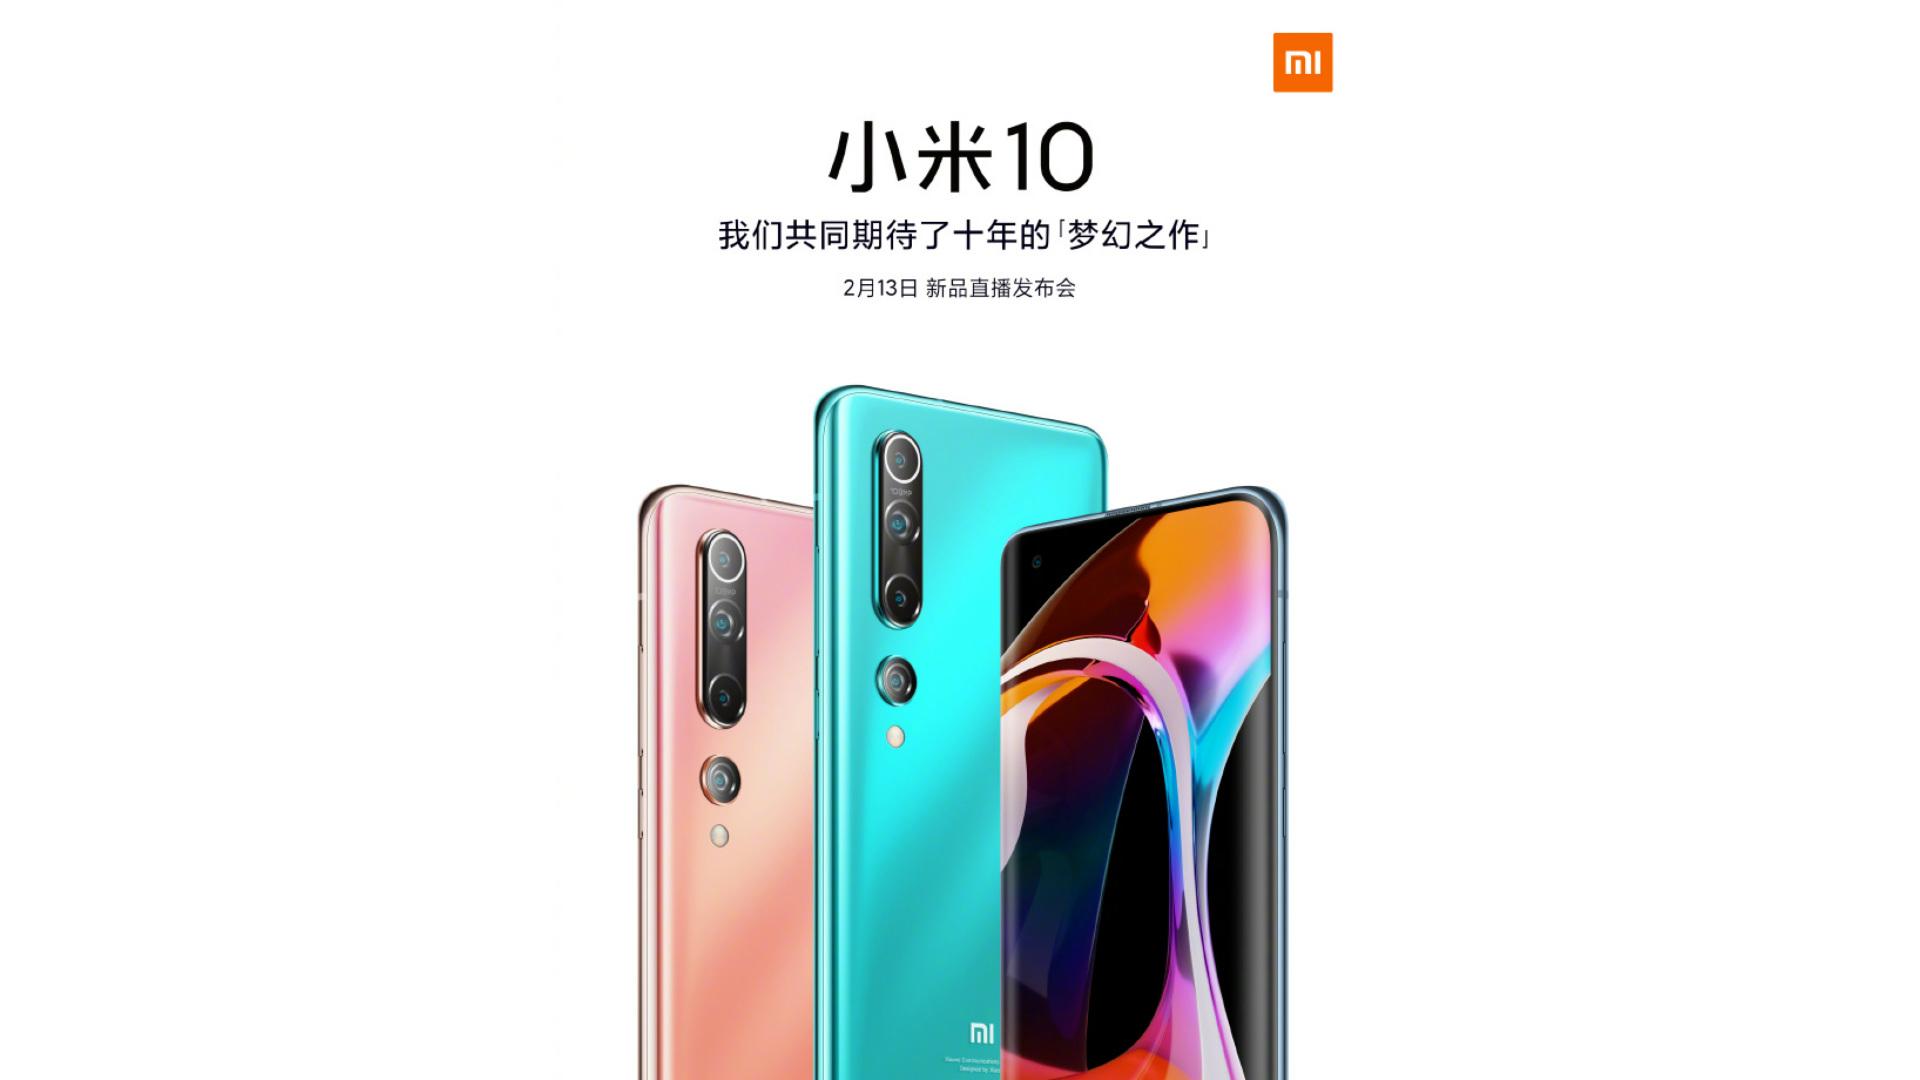 Xiaomi Mi 10 series launch poster